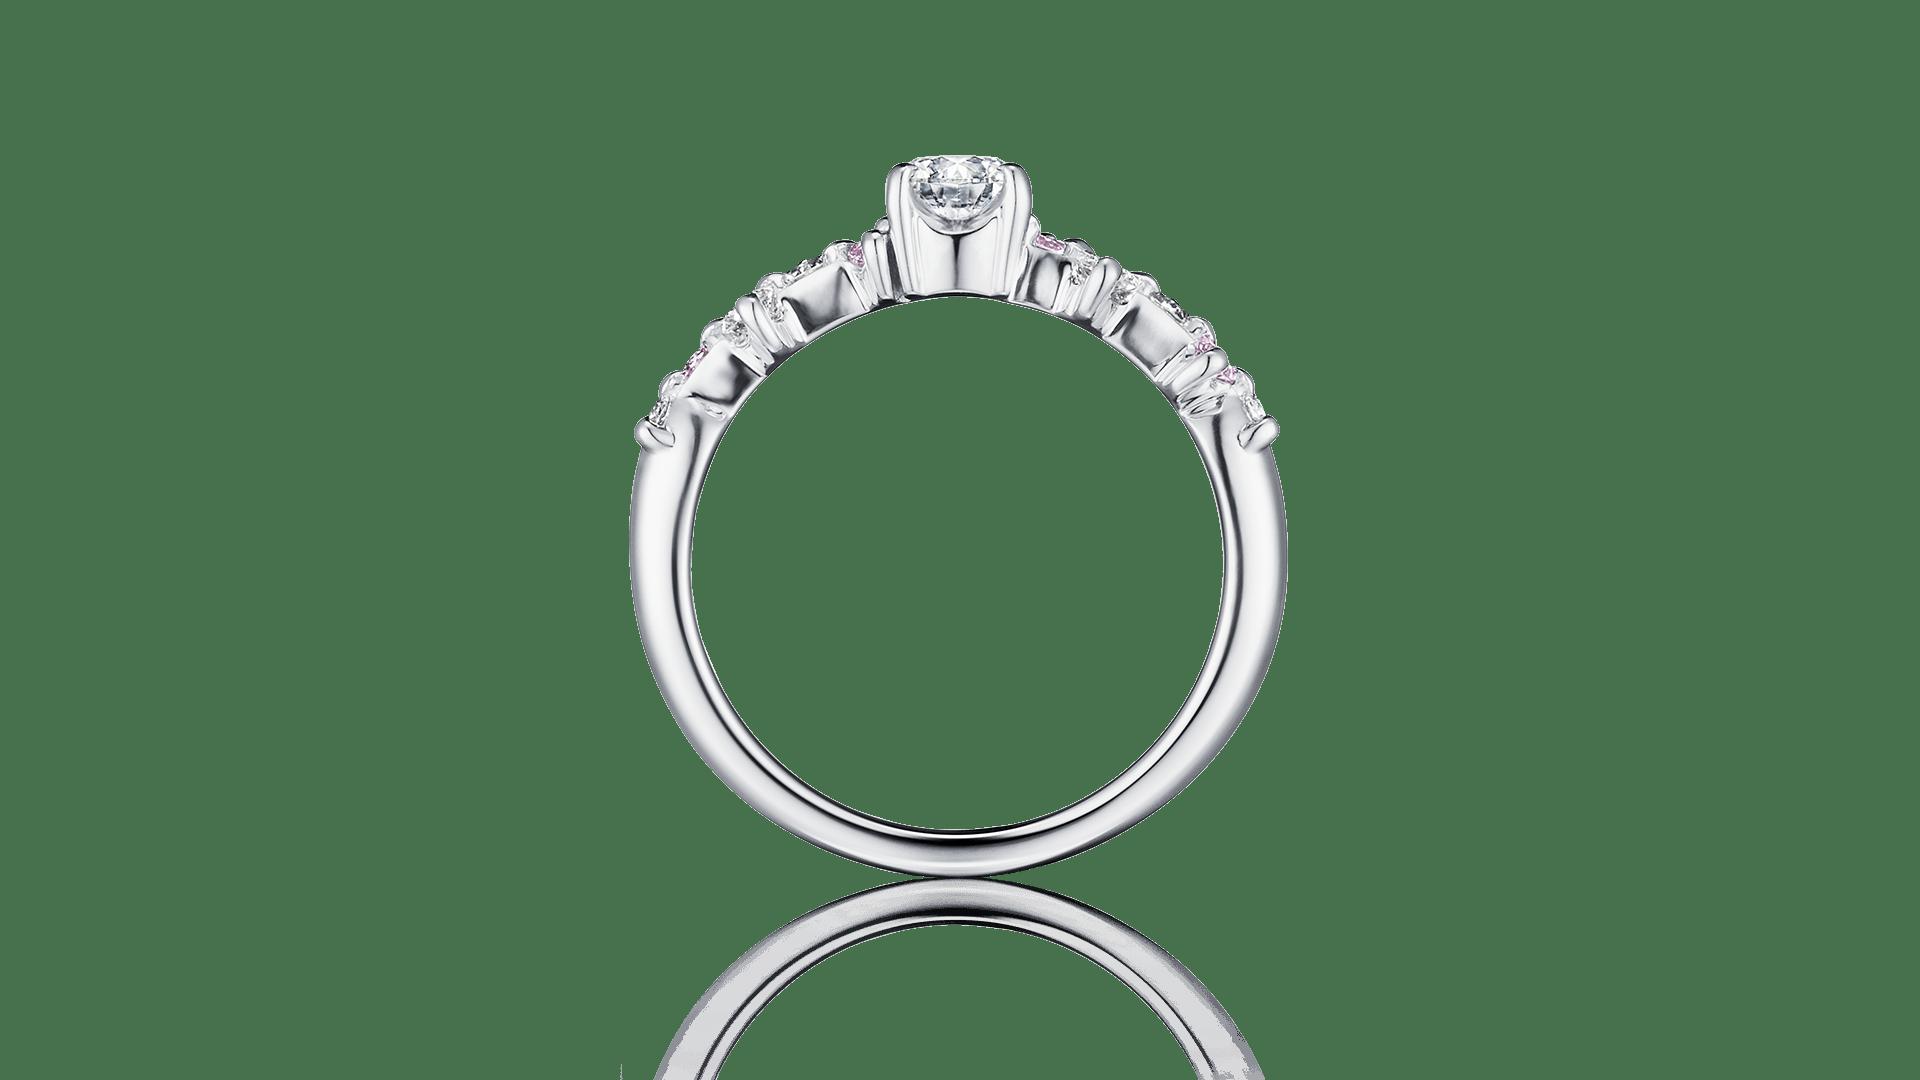 aries アリエス | 婚約指輪サムネイル 2